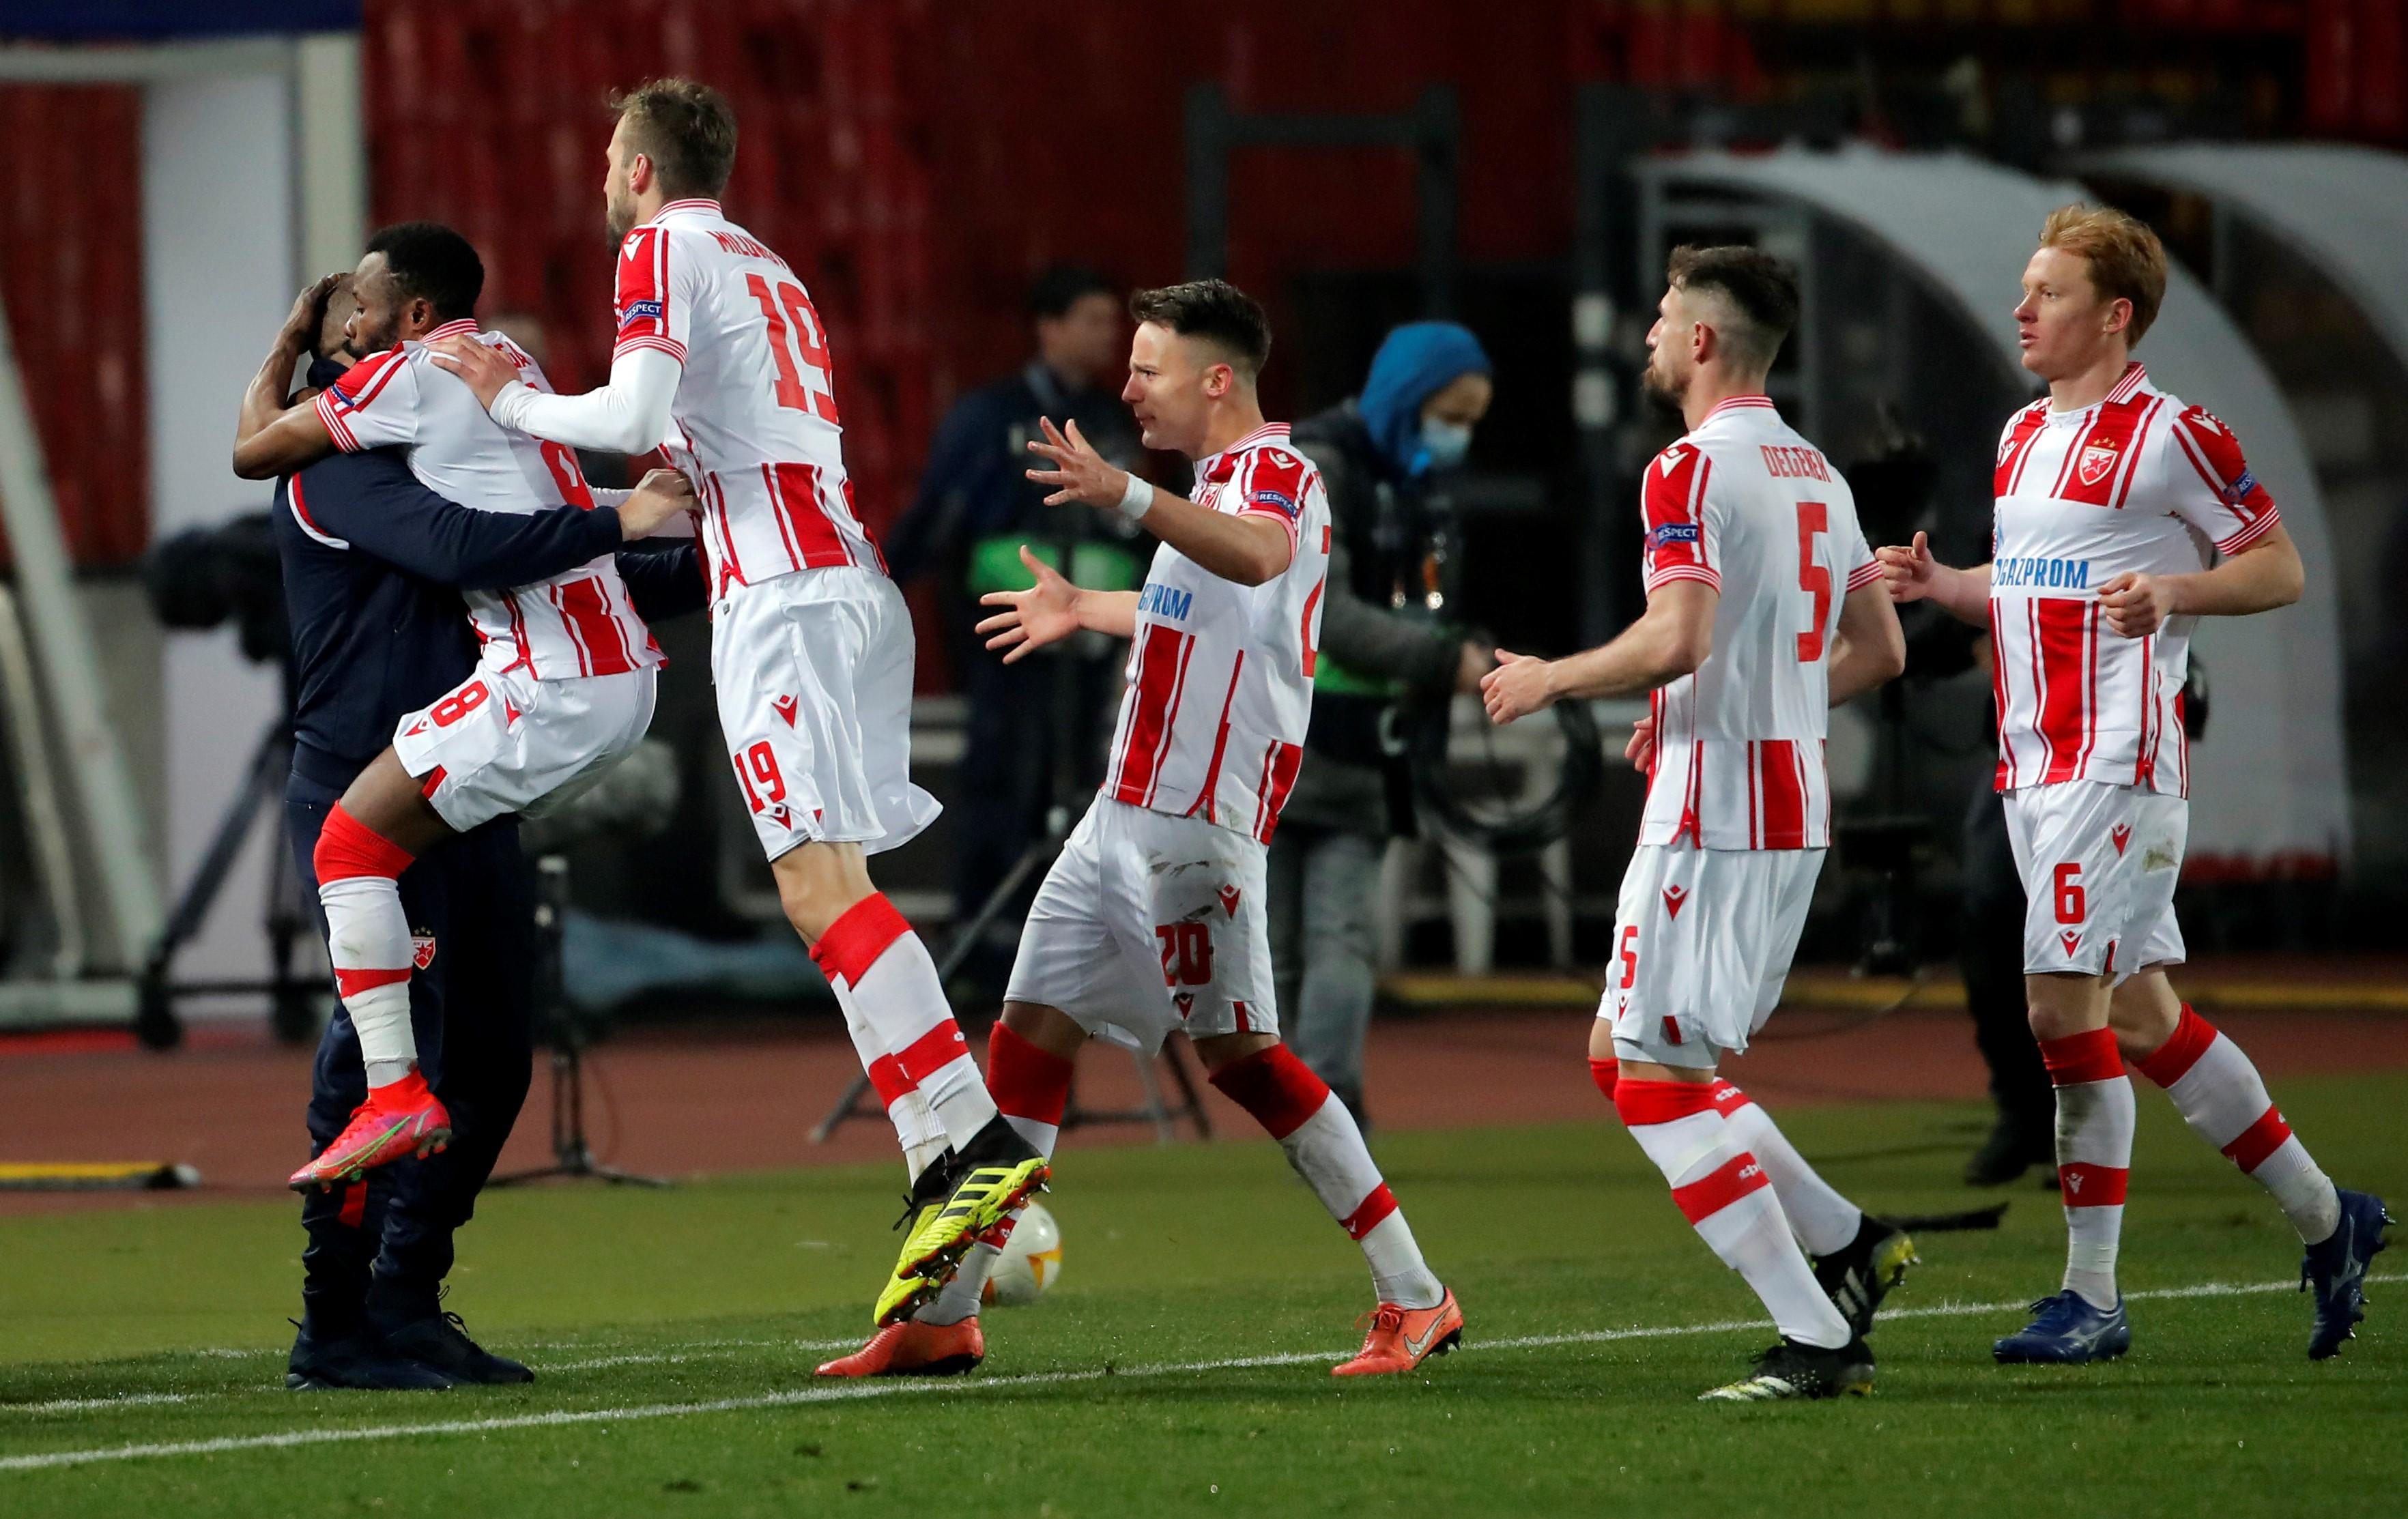 SERBIA-BELGRADE-FOOTBALL-UEFA EUROPA LEAGUE-CRVENA ZVEZDA VS AC MILAN